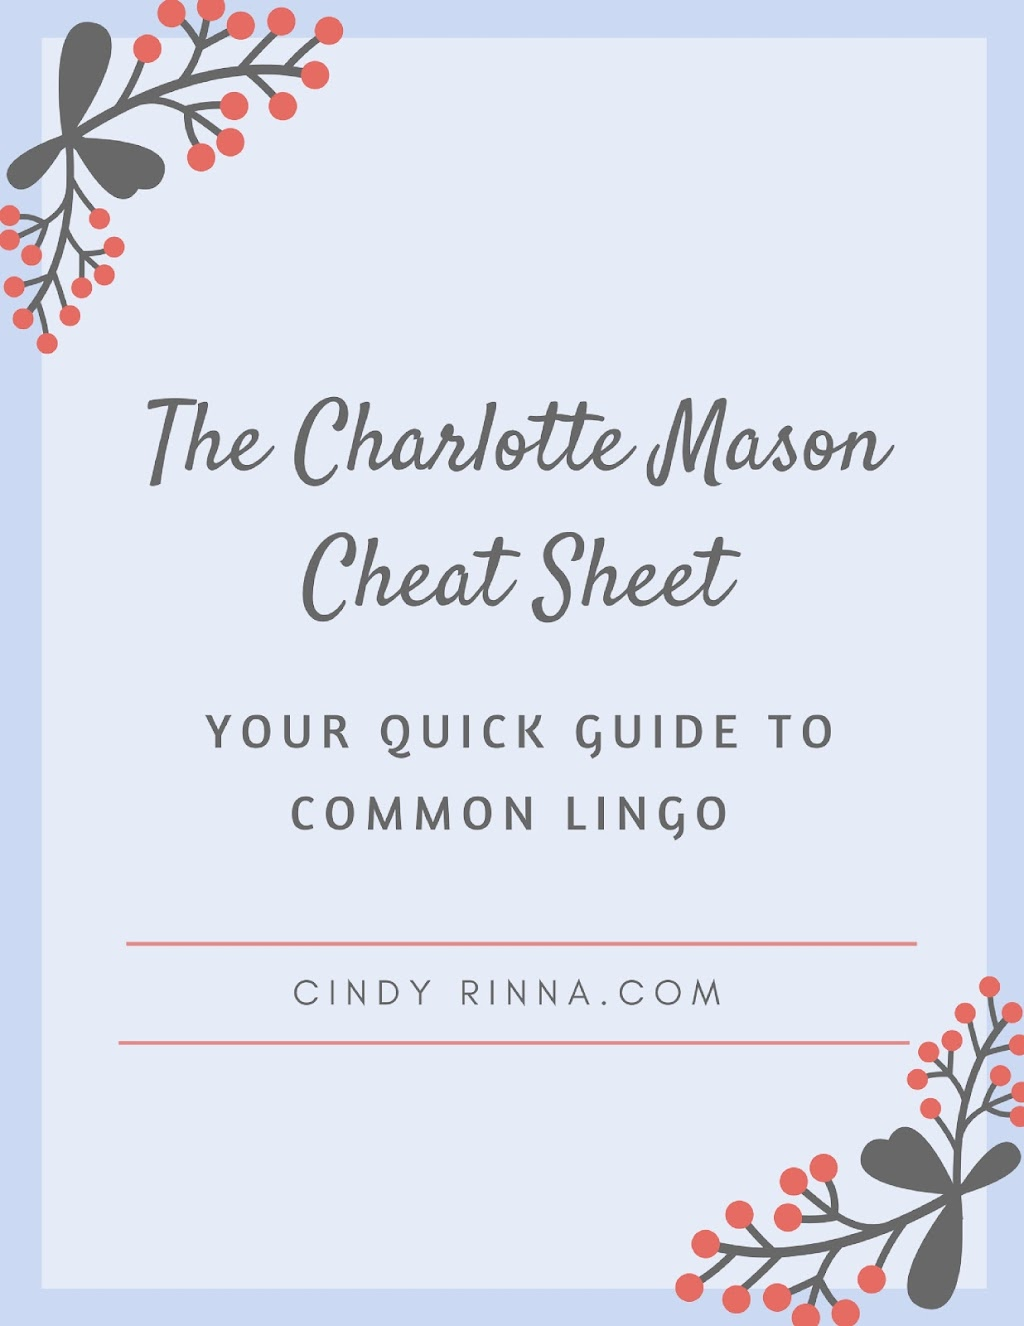 Charlotte Mason via Cindy Rinna.com